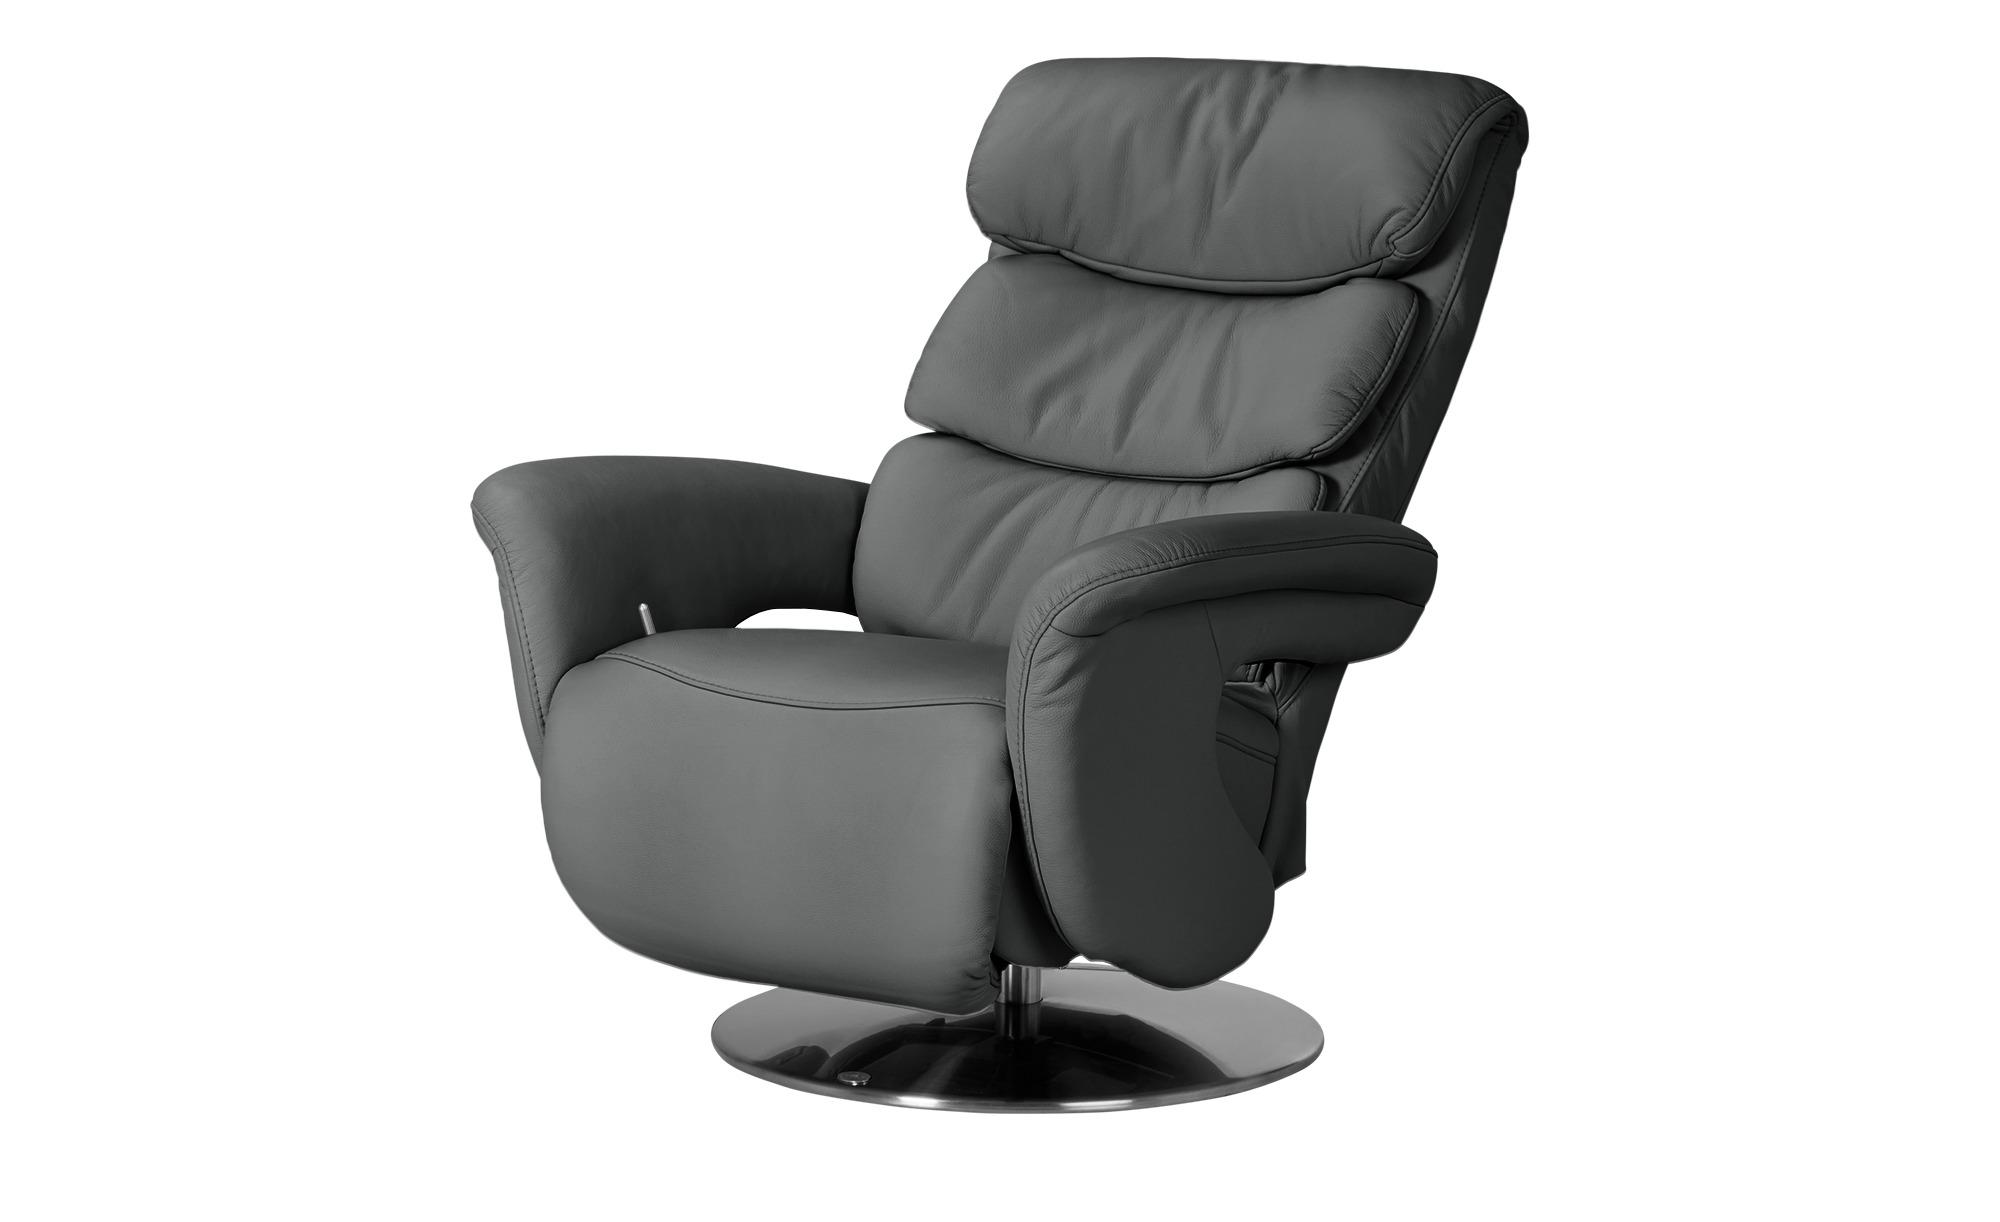 himolla Leder-Relaxsessel grau - Leder 7228 ¦ grau ¦ Maße (cm): B: 83 H: 113 T: 92 Polstermöbel > Sessel > Fernsehsessel - Höffner